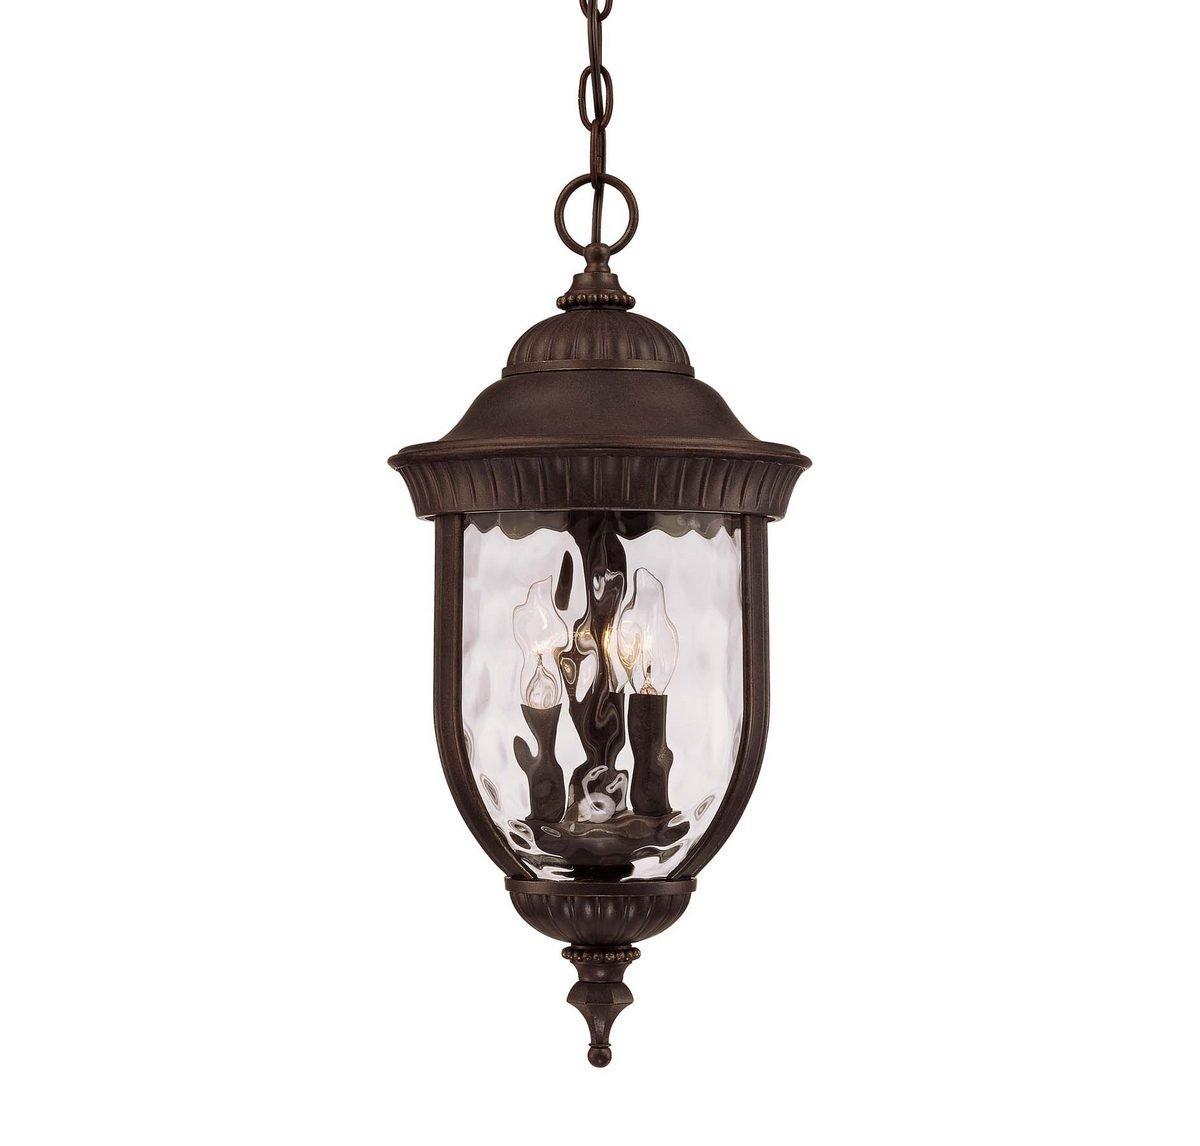 Savoy House 5-60328-40 Three Light Hanging Lantern